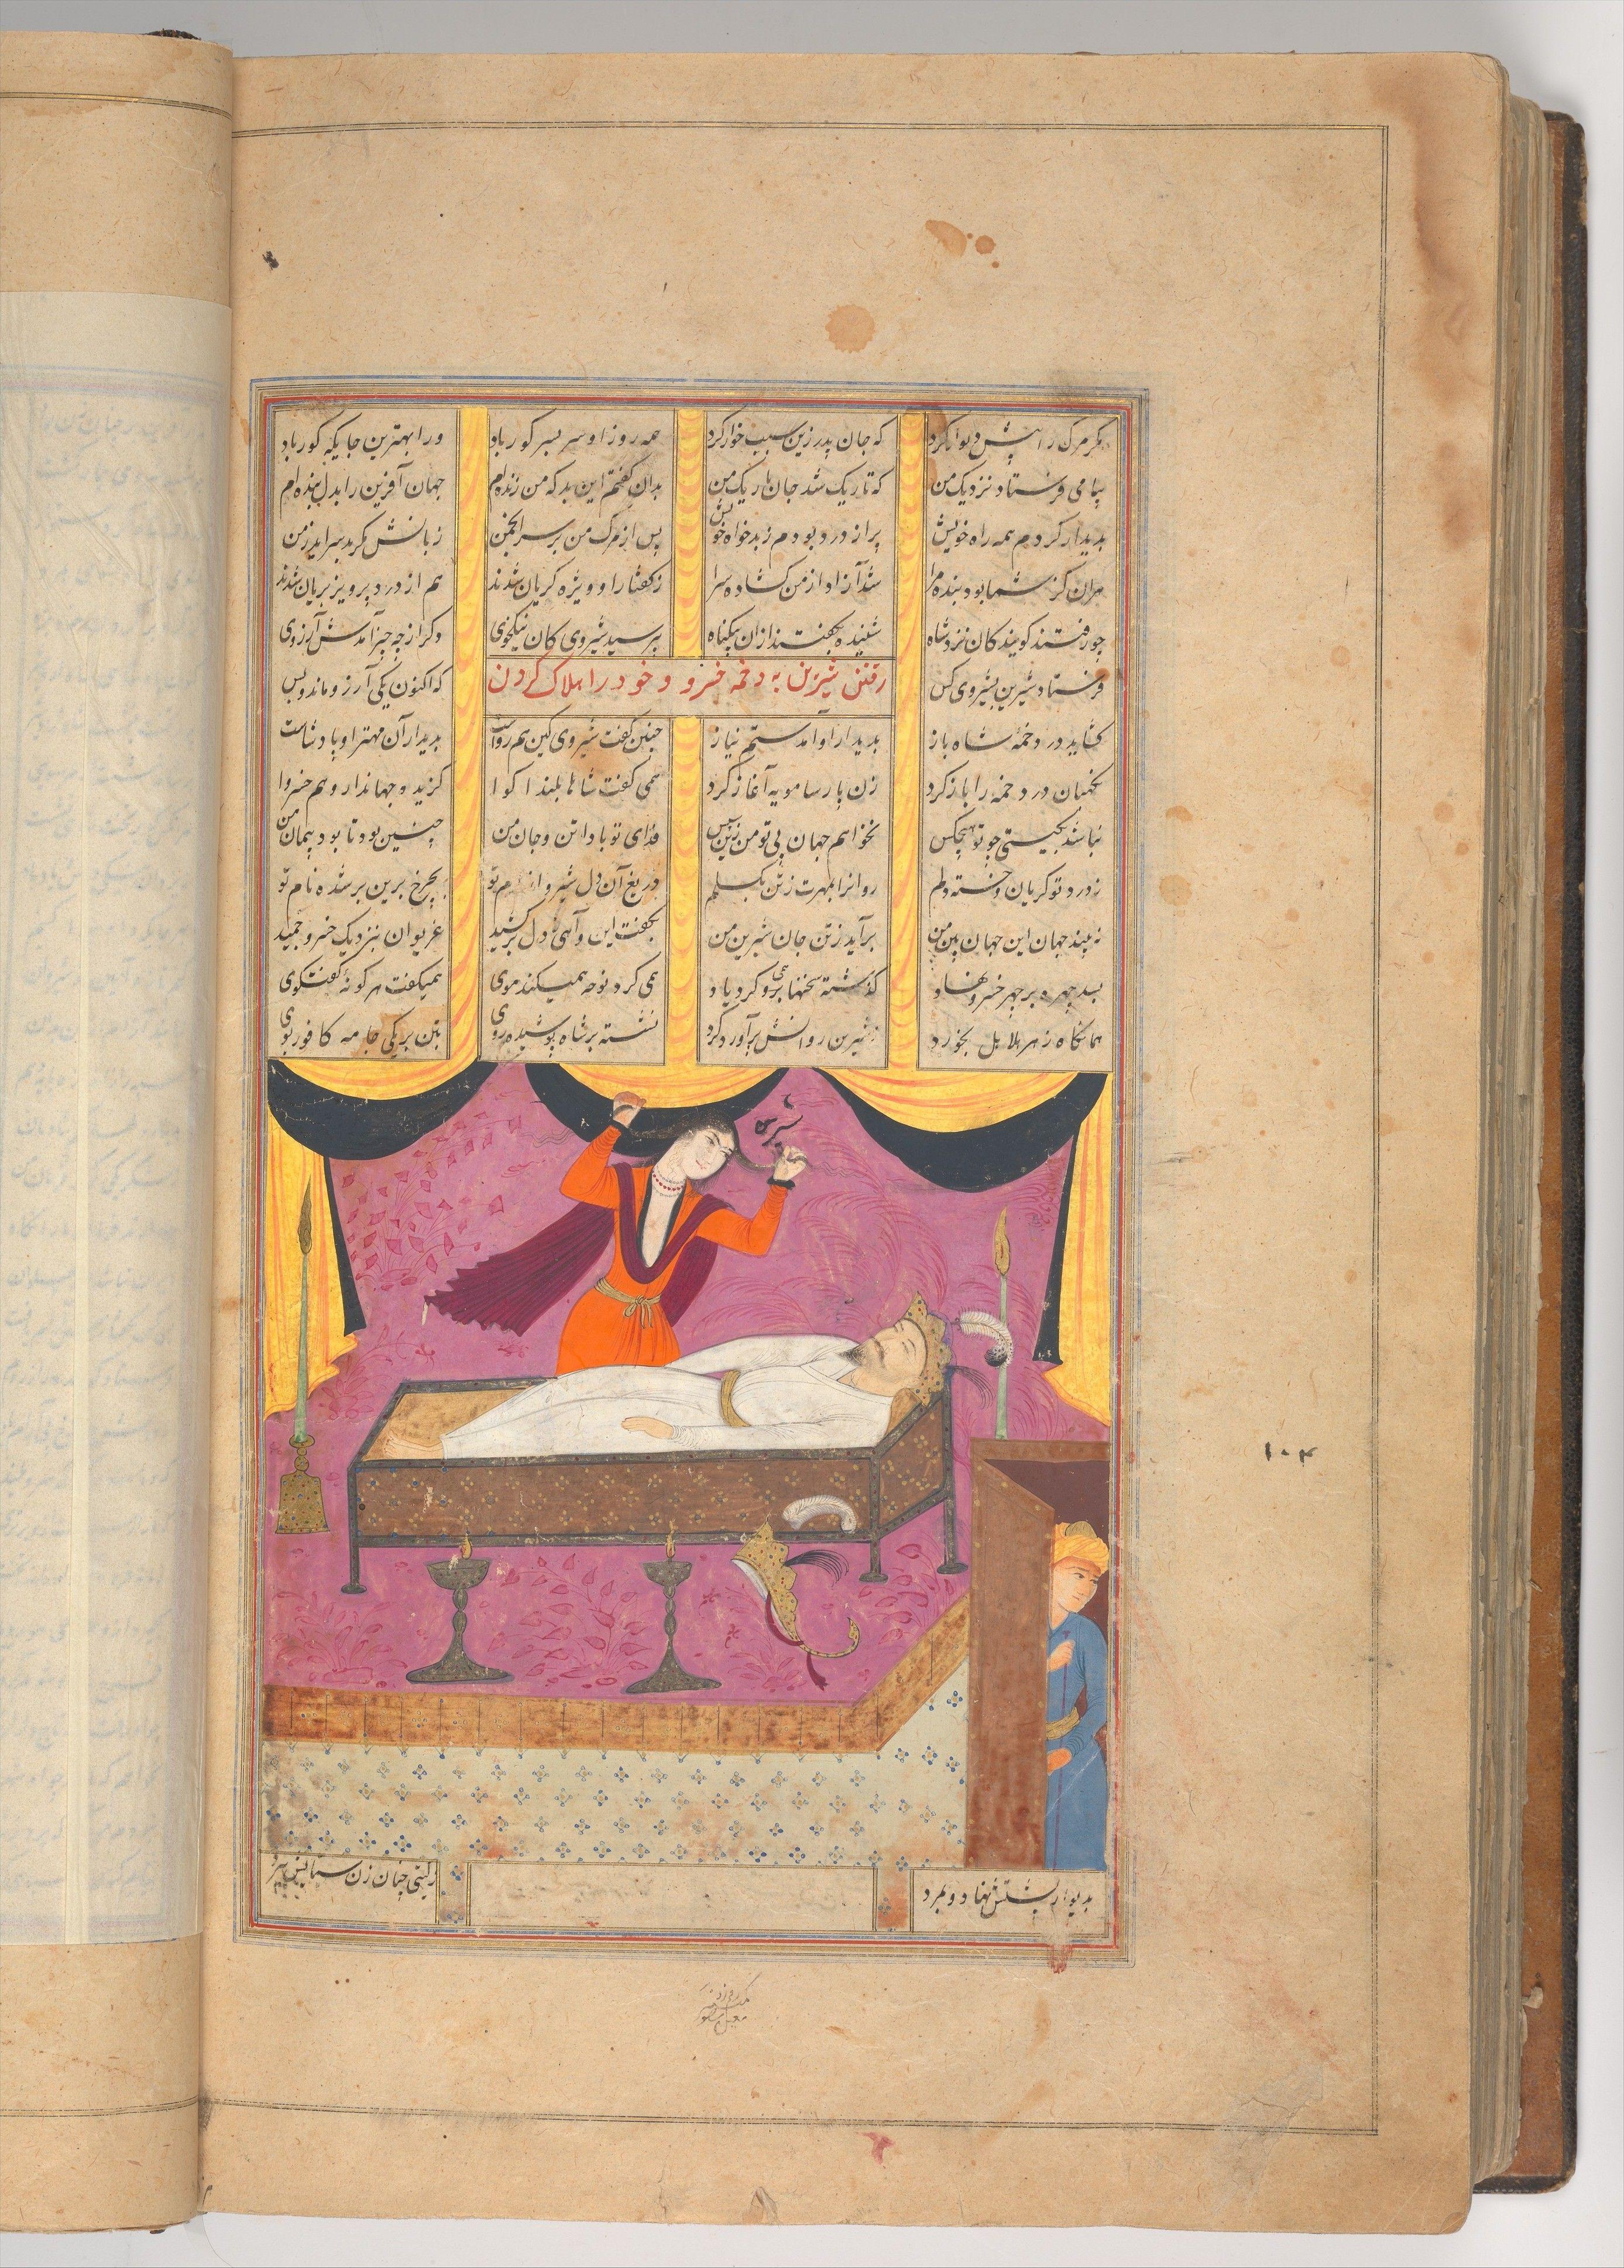 Painting By Mu In Musavvir Shahnama Book Of Kings Of Firdausi 1660s Safavid Probably Isfahan The Met Art Painting Metropolitan Museum Of Art